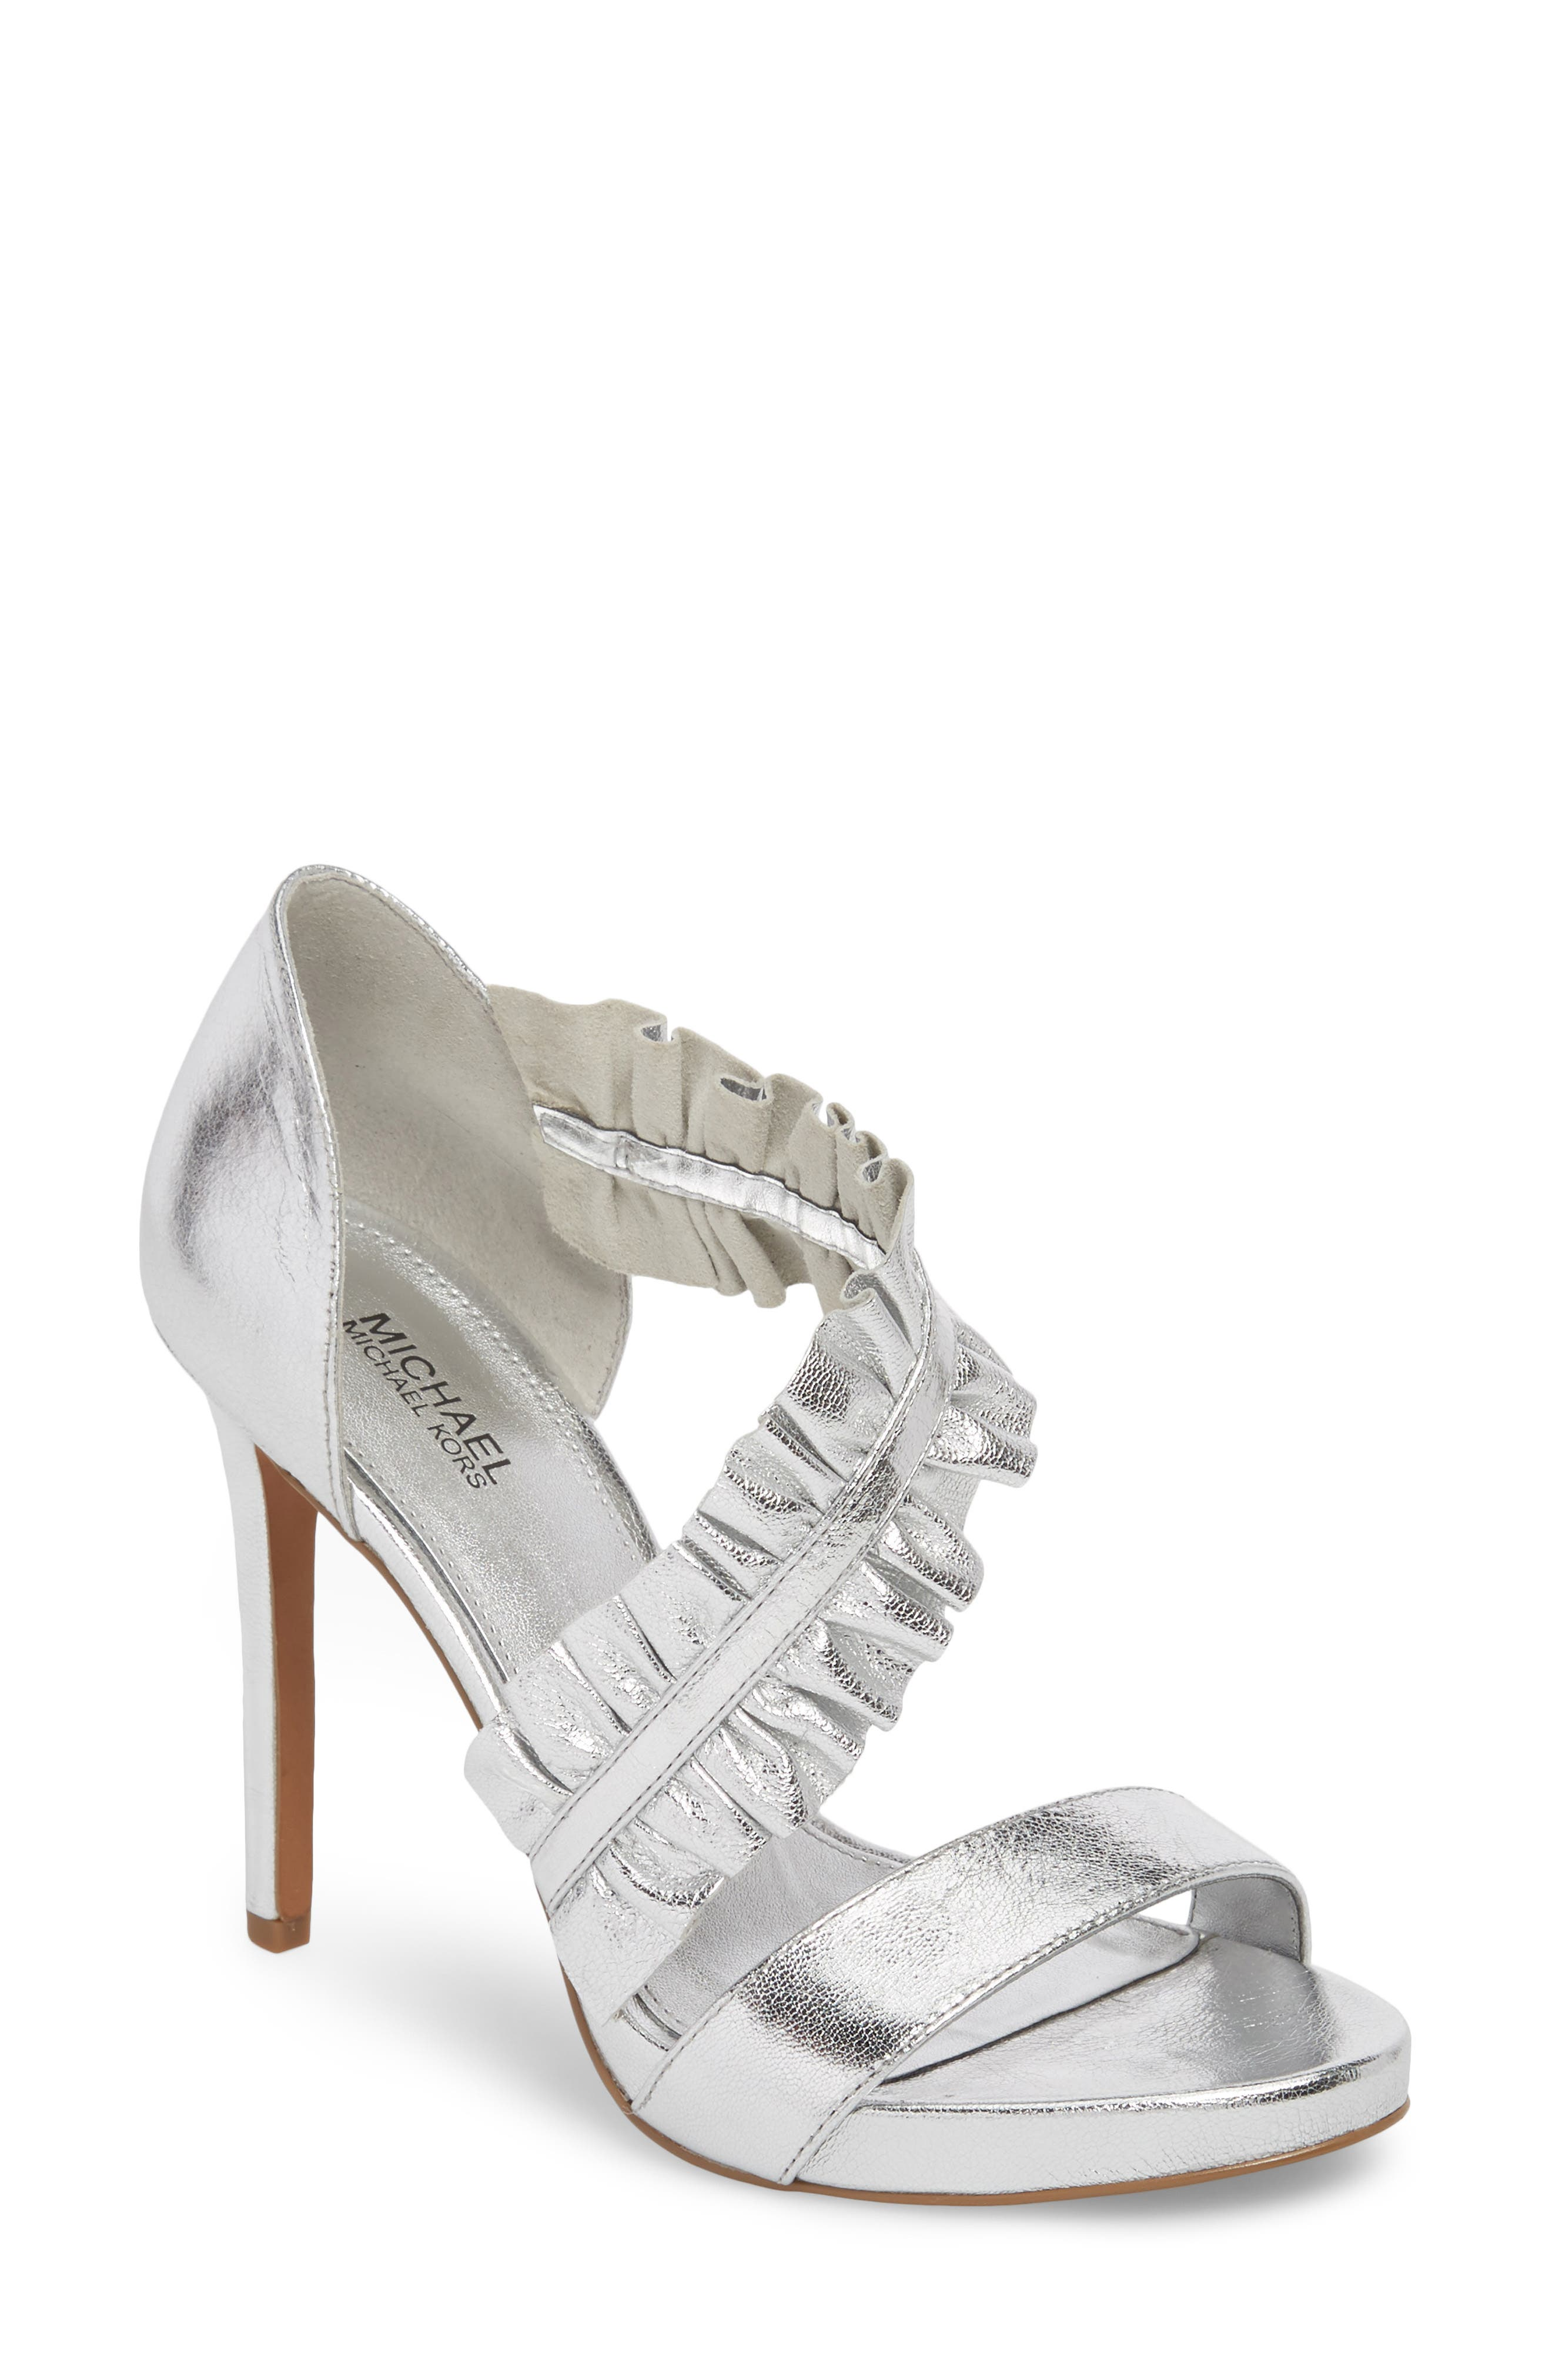 Bella Ruffle Sandal,                         Main,                         color, Silver Nappa Leather